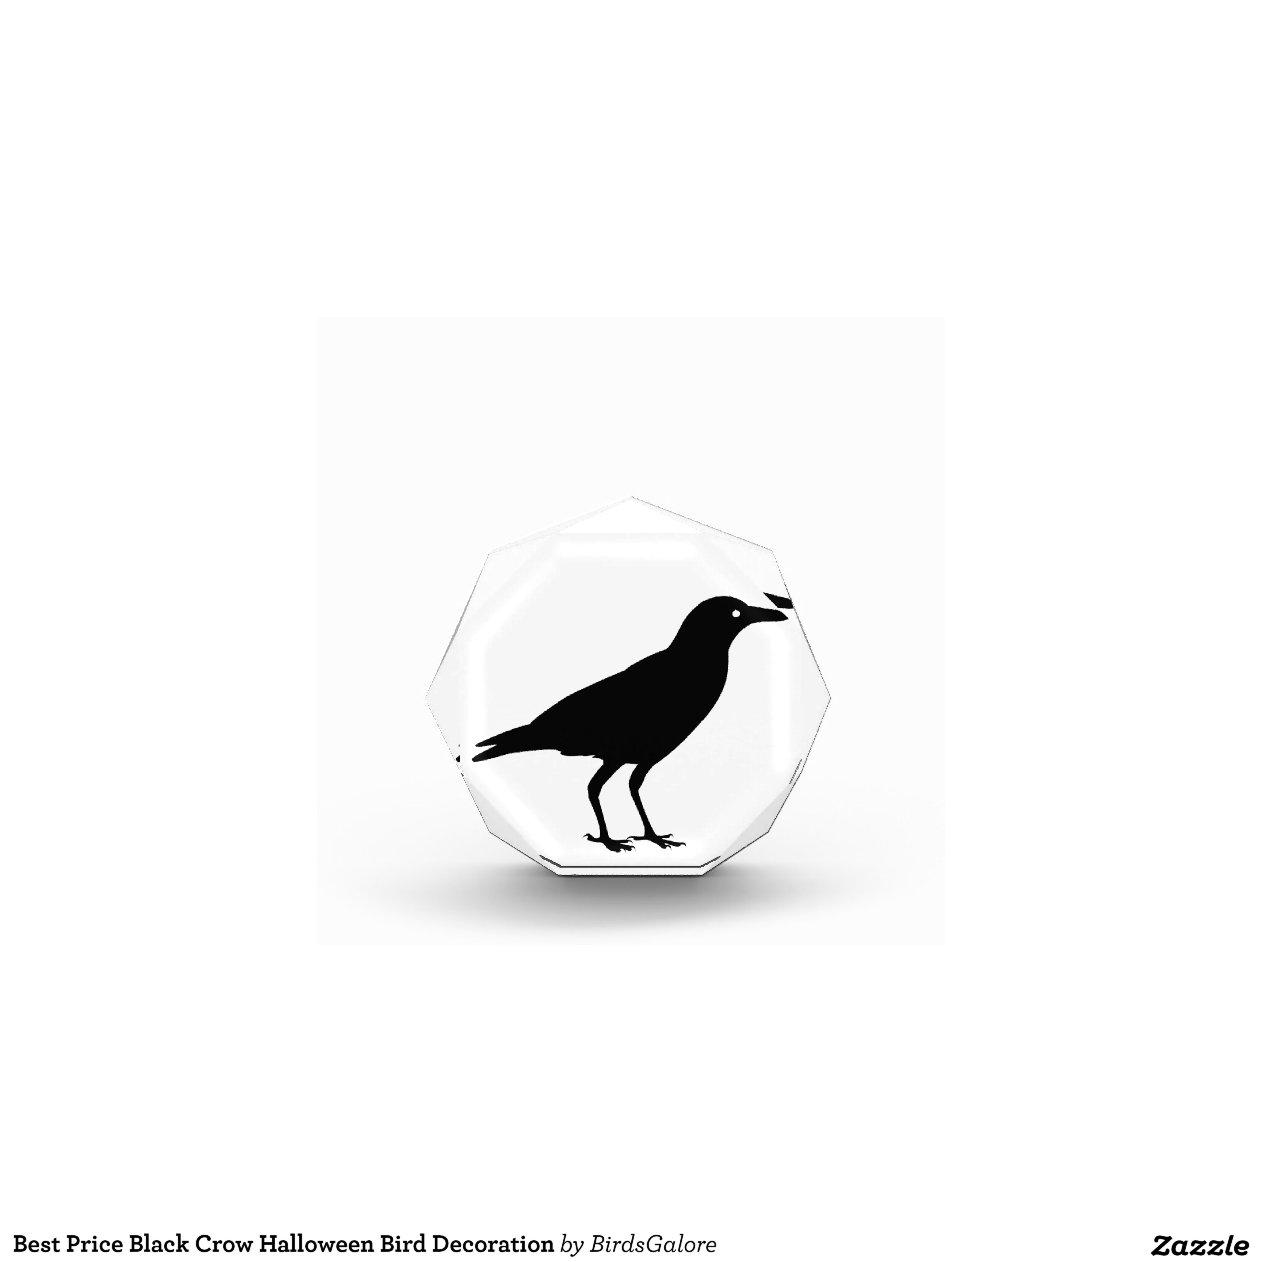 Best Price Black Crow Halloween Bird Decoration Award Zazzle